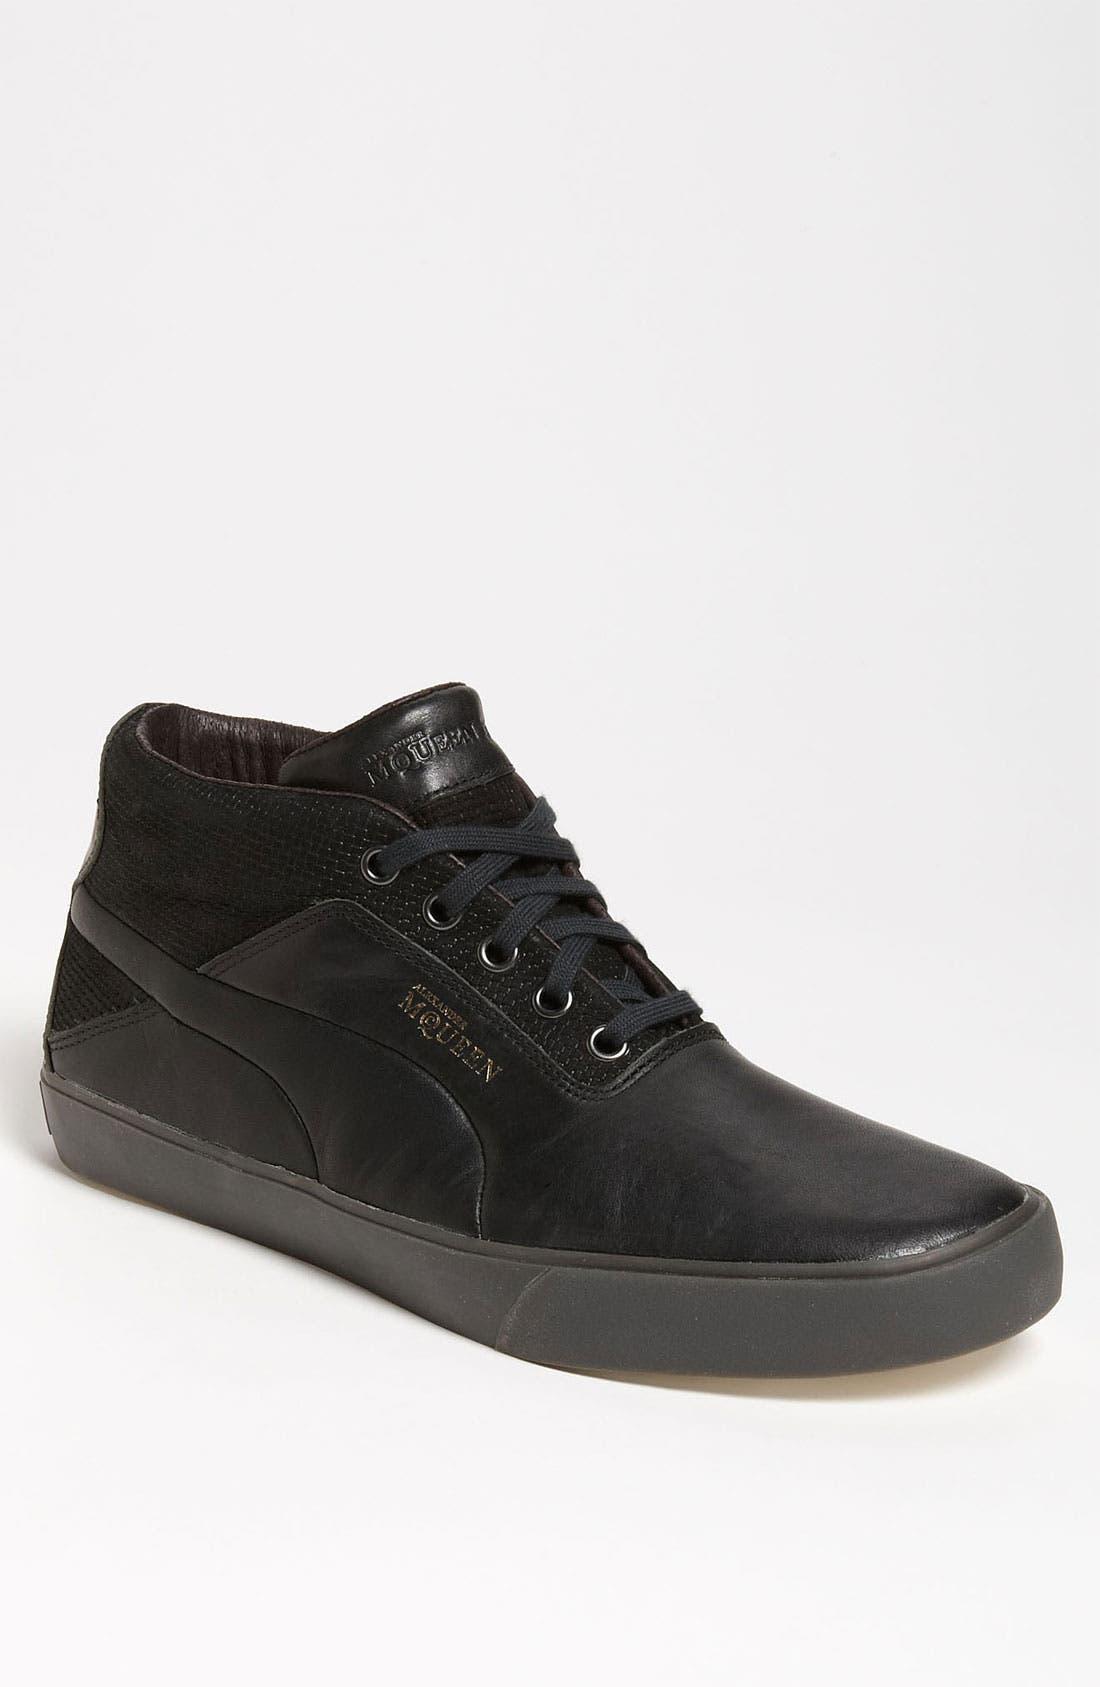 PUMA, 'Alexander McQueen - Deck Mid' Sneaker, Main thumbnail 1, color, 001